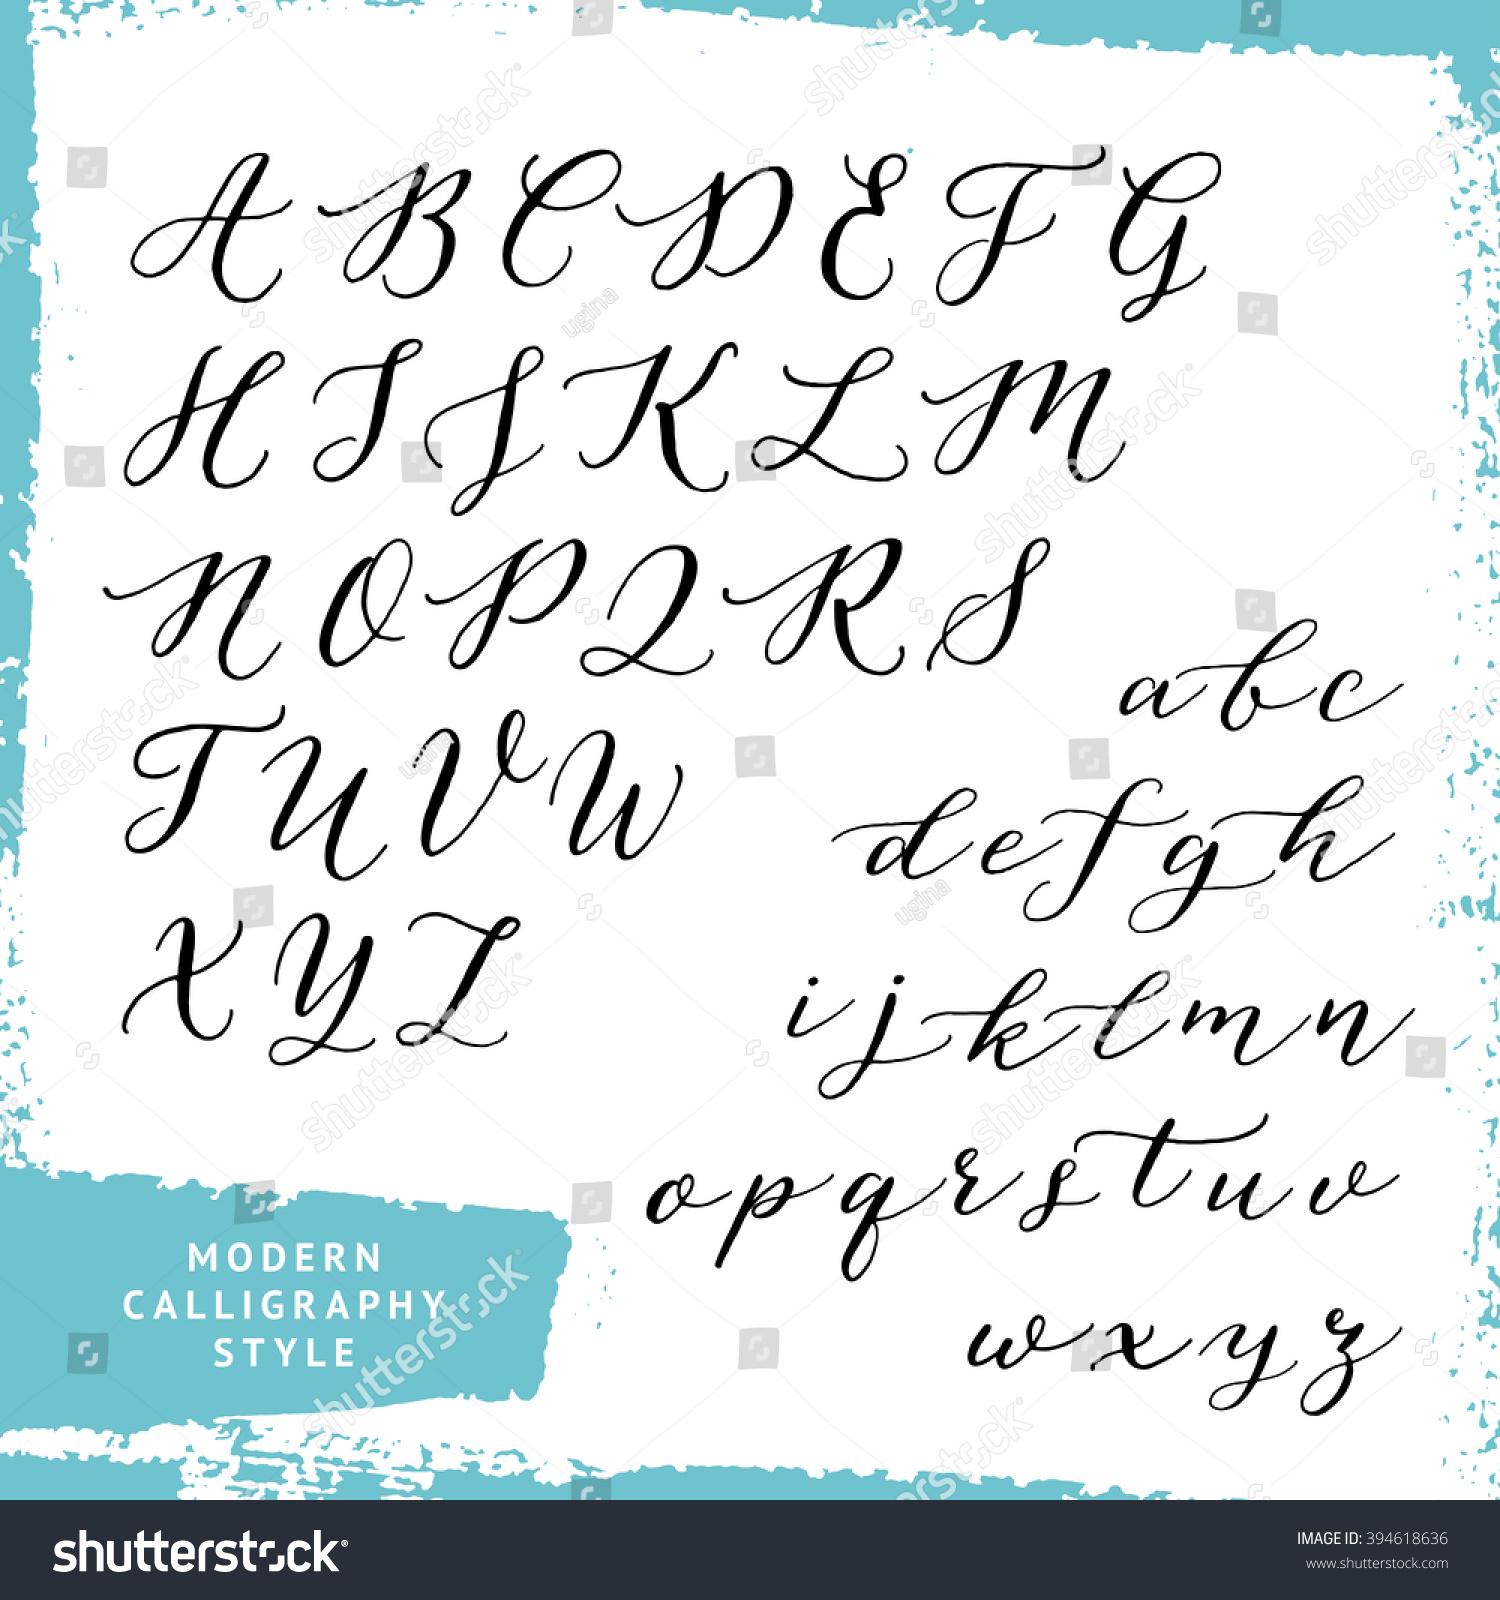 Modern calligraphy style handwritten script alphabet stock